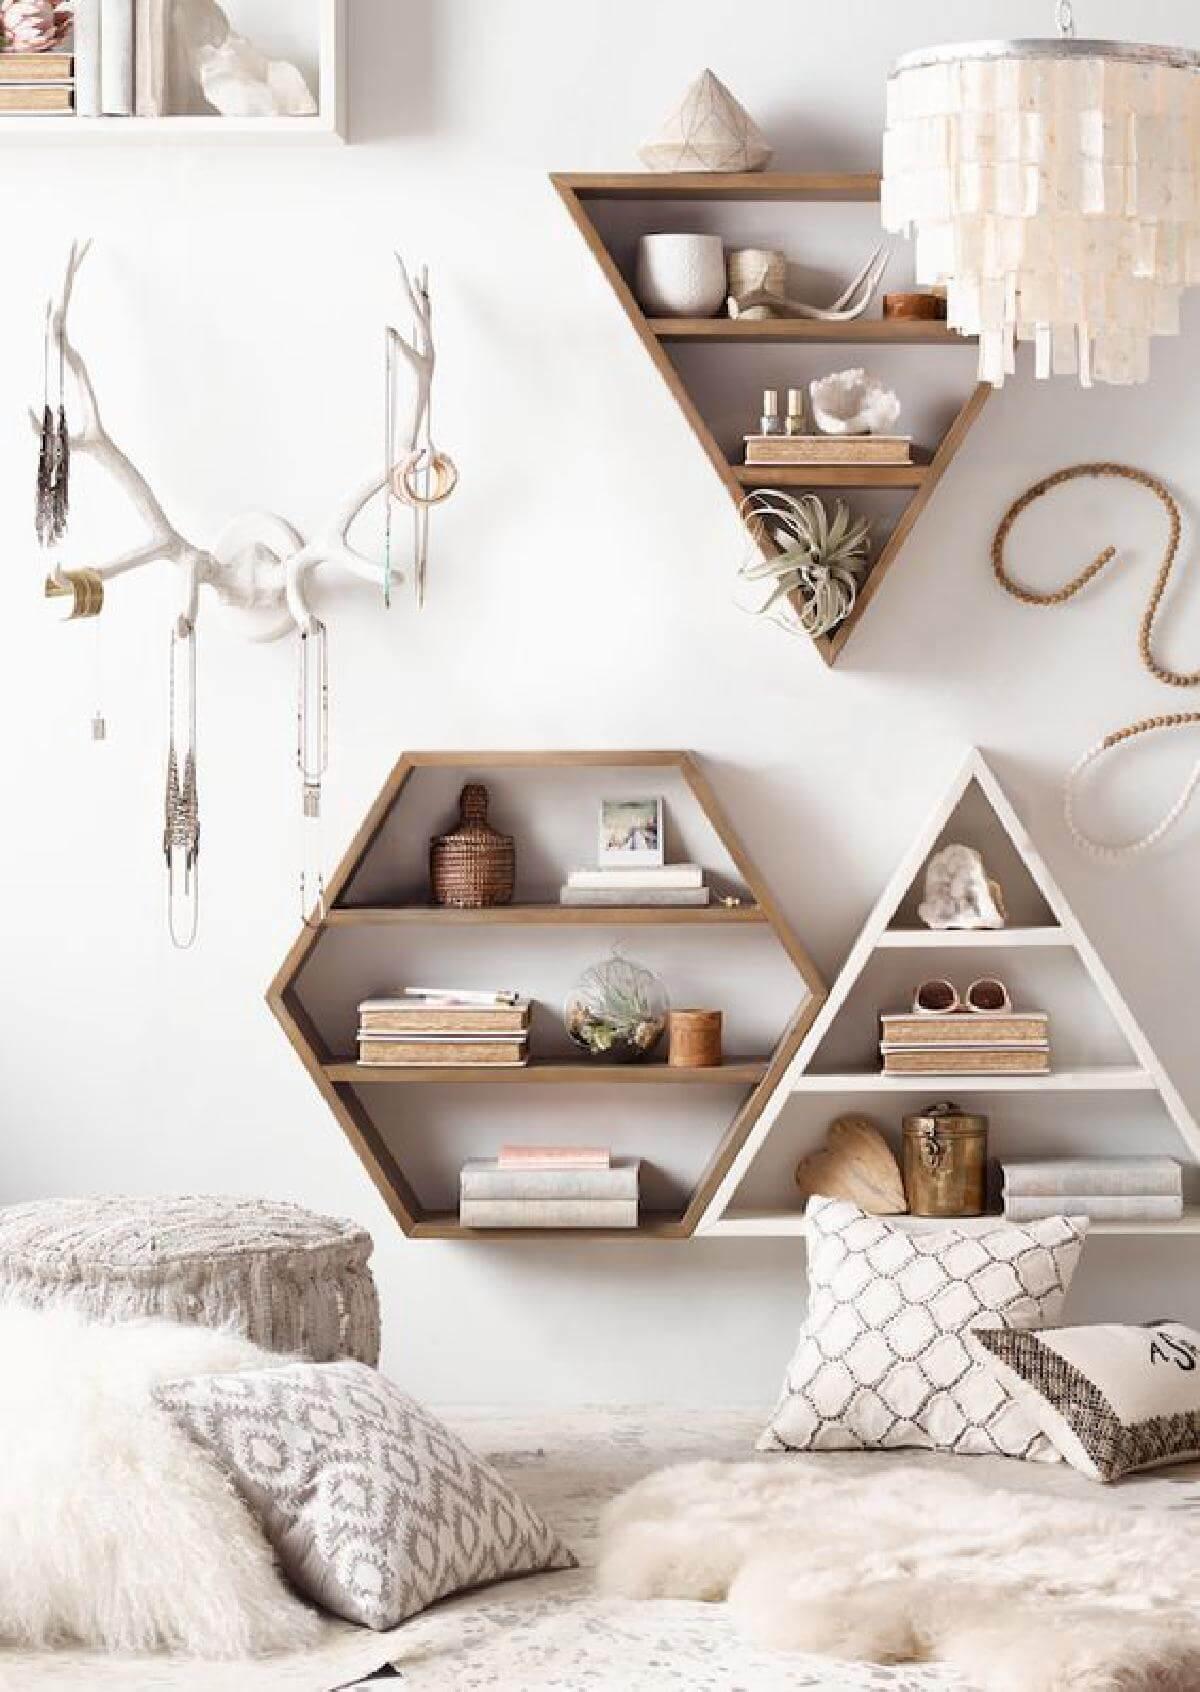 Set Of Wooden Rustic Geometric Wall Shelves